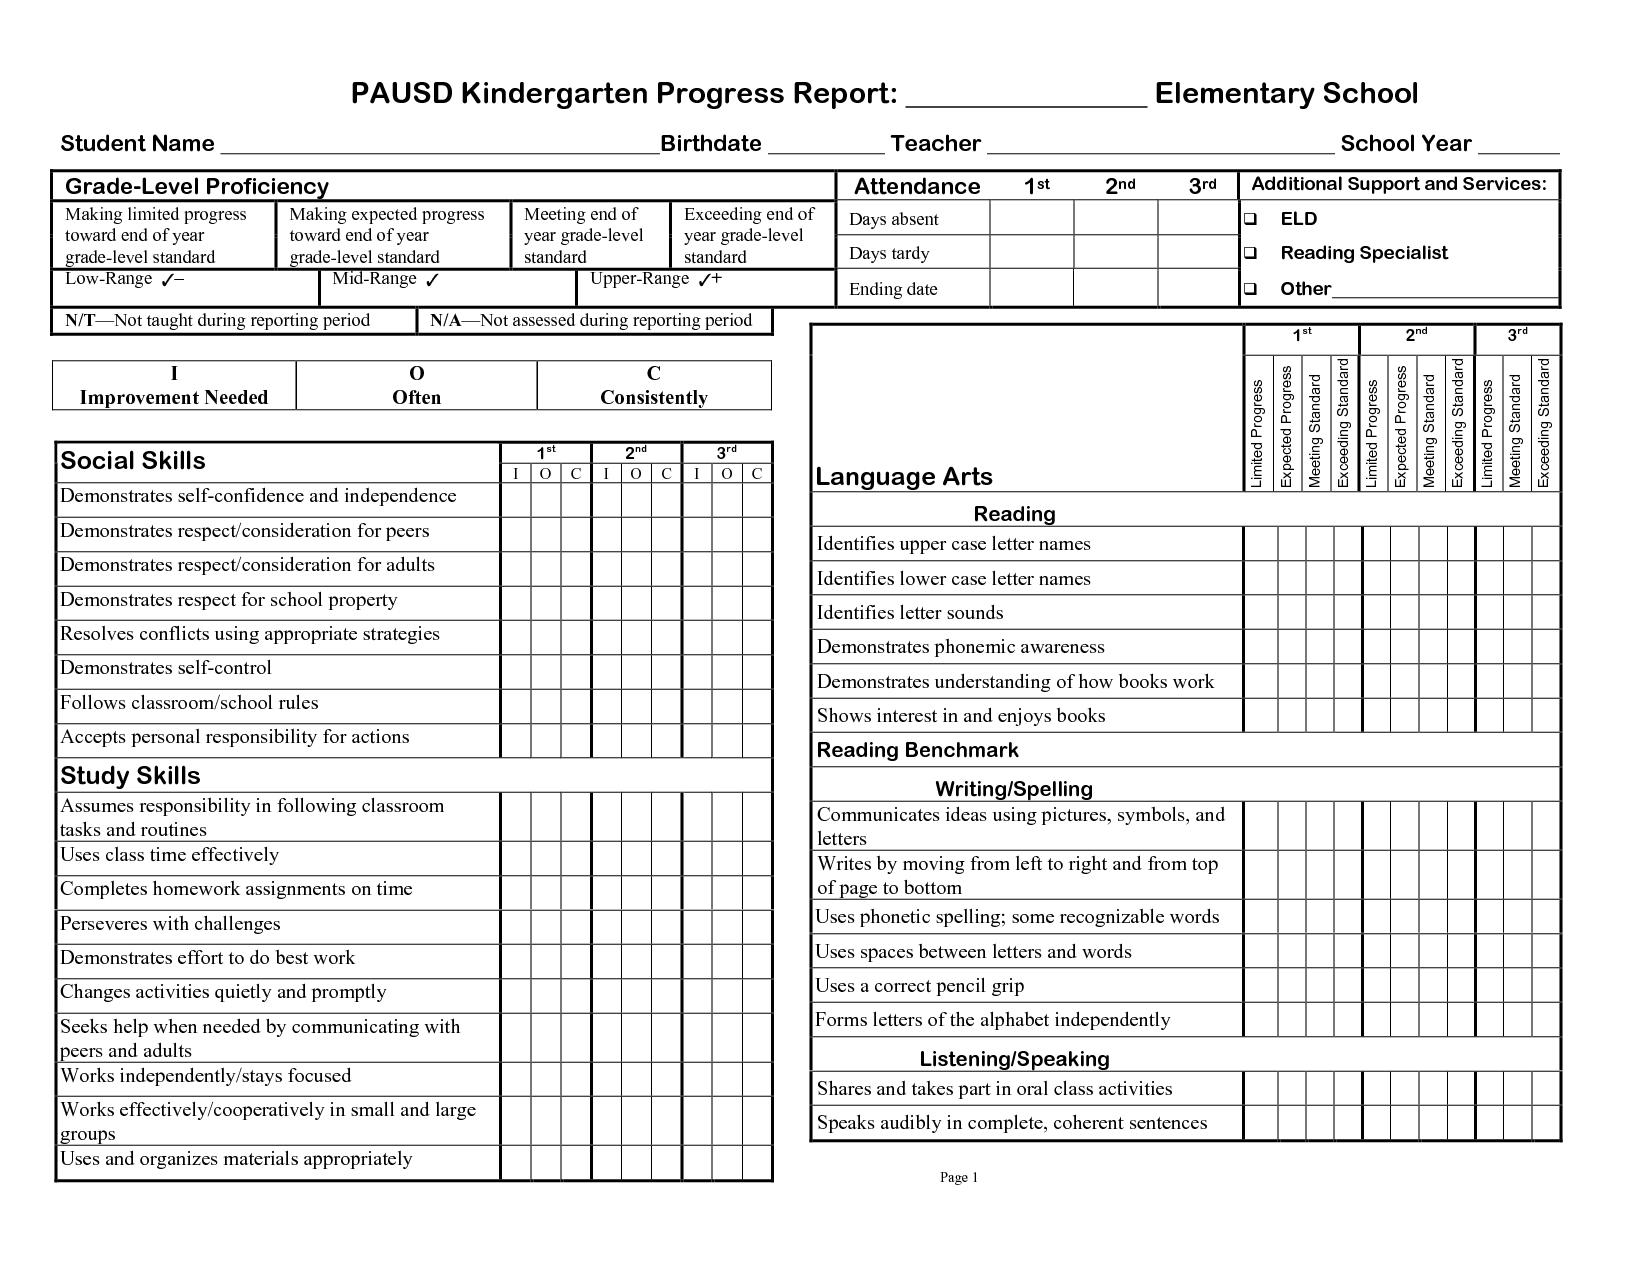 Kindergarten Social Skills Progress Report Blank Templates intended for Soccer Report Card Template